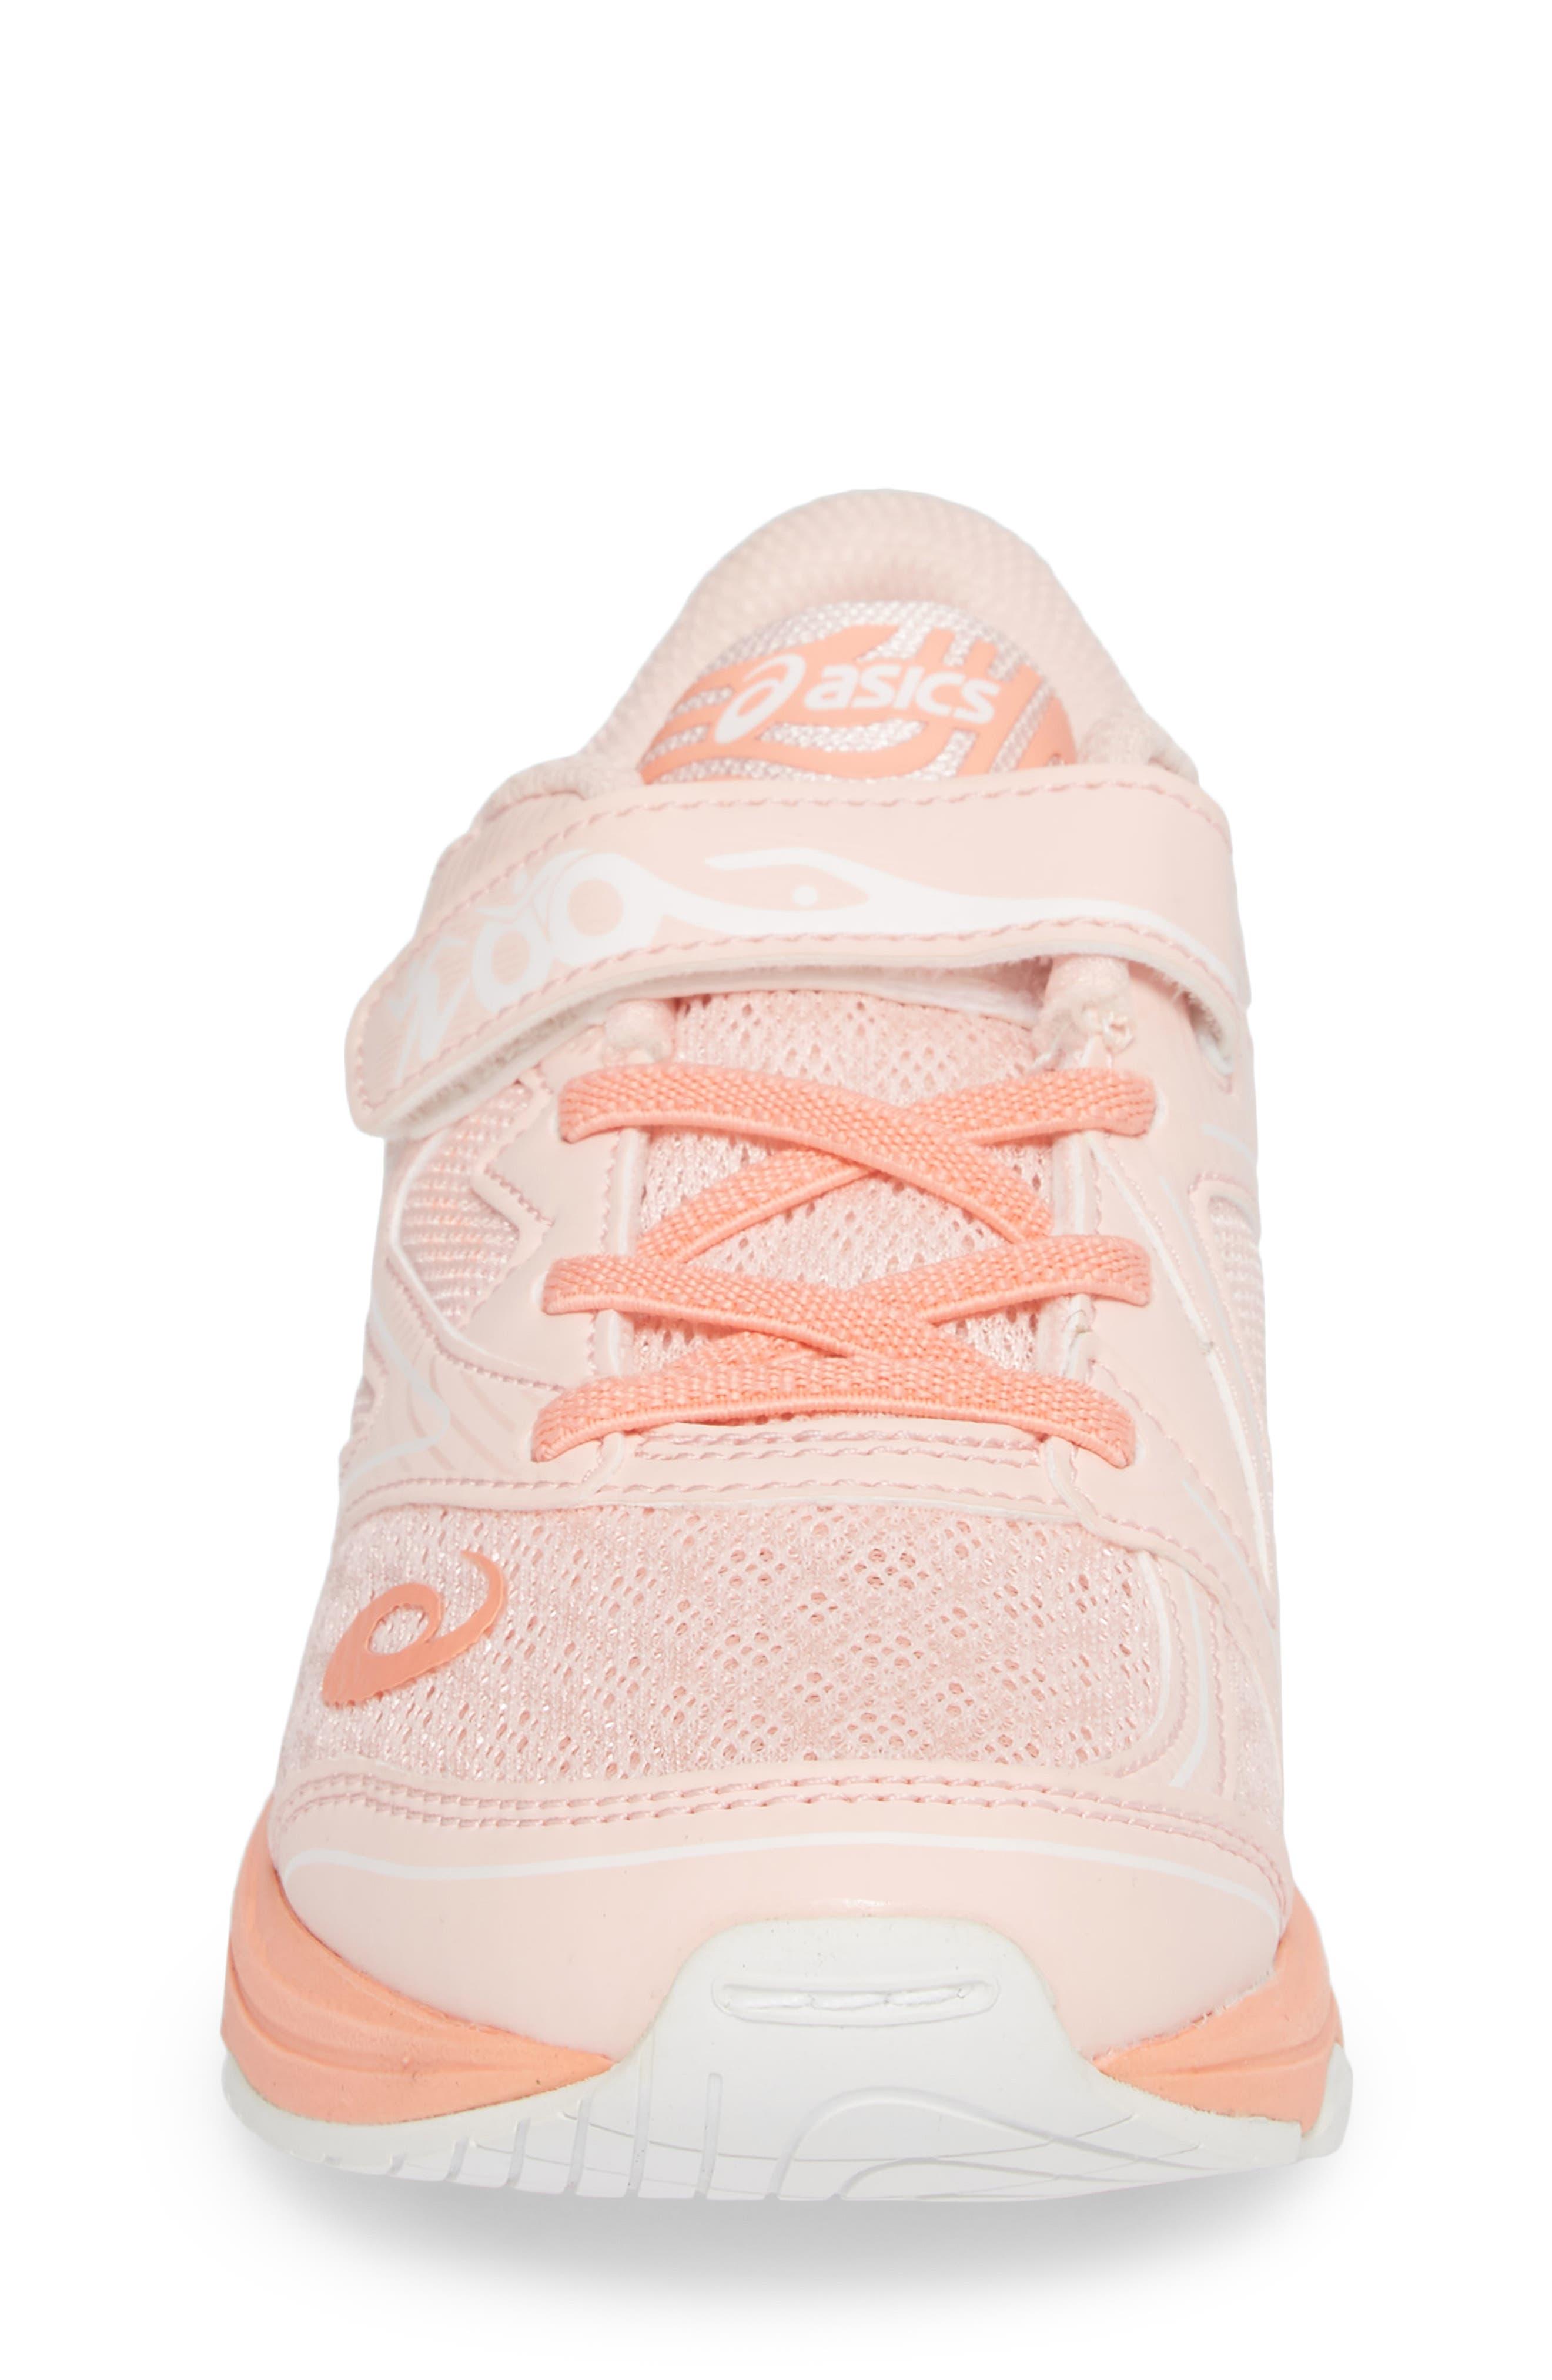 Noosa PS Sneaker,                             Alternate thumbnail 4, color,                             Seashell Pink/ Begonia/ White